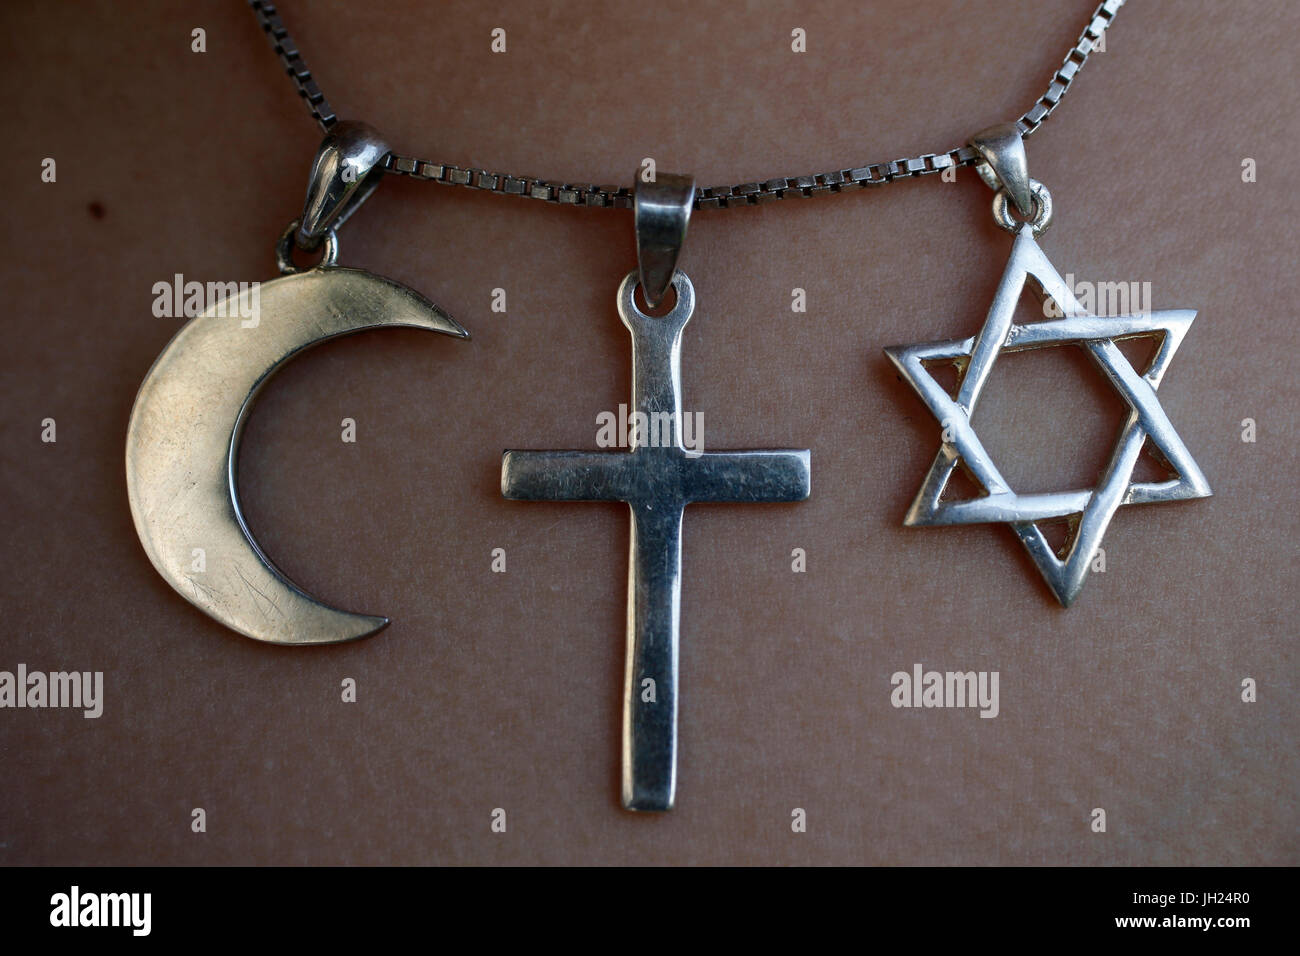 Symbols of islam, christianity and judaism. - Stock Image